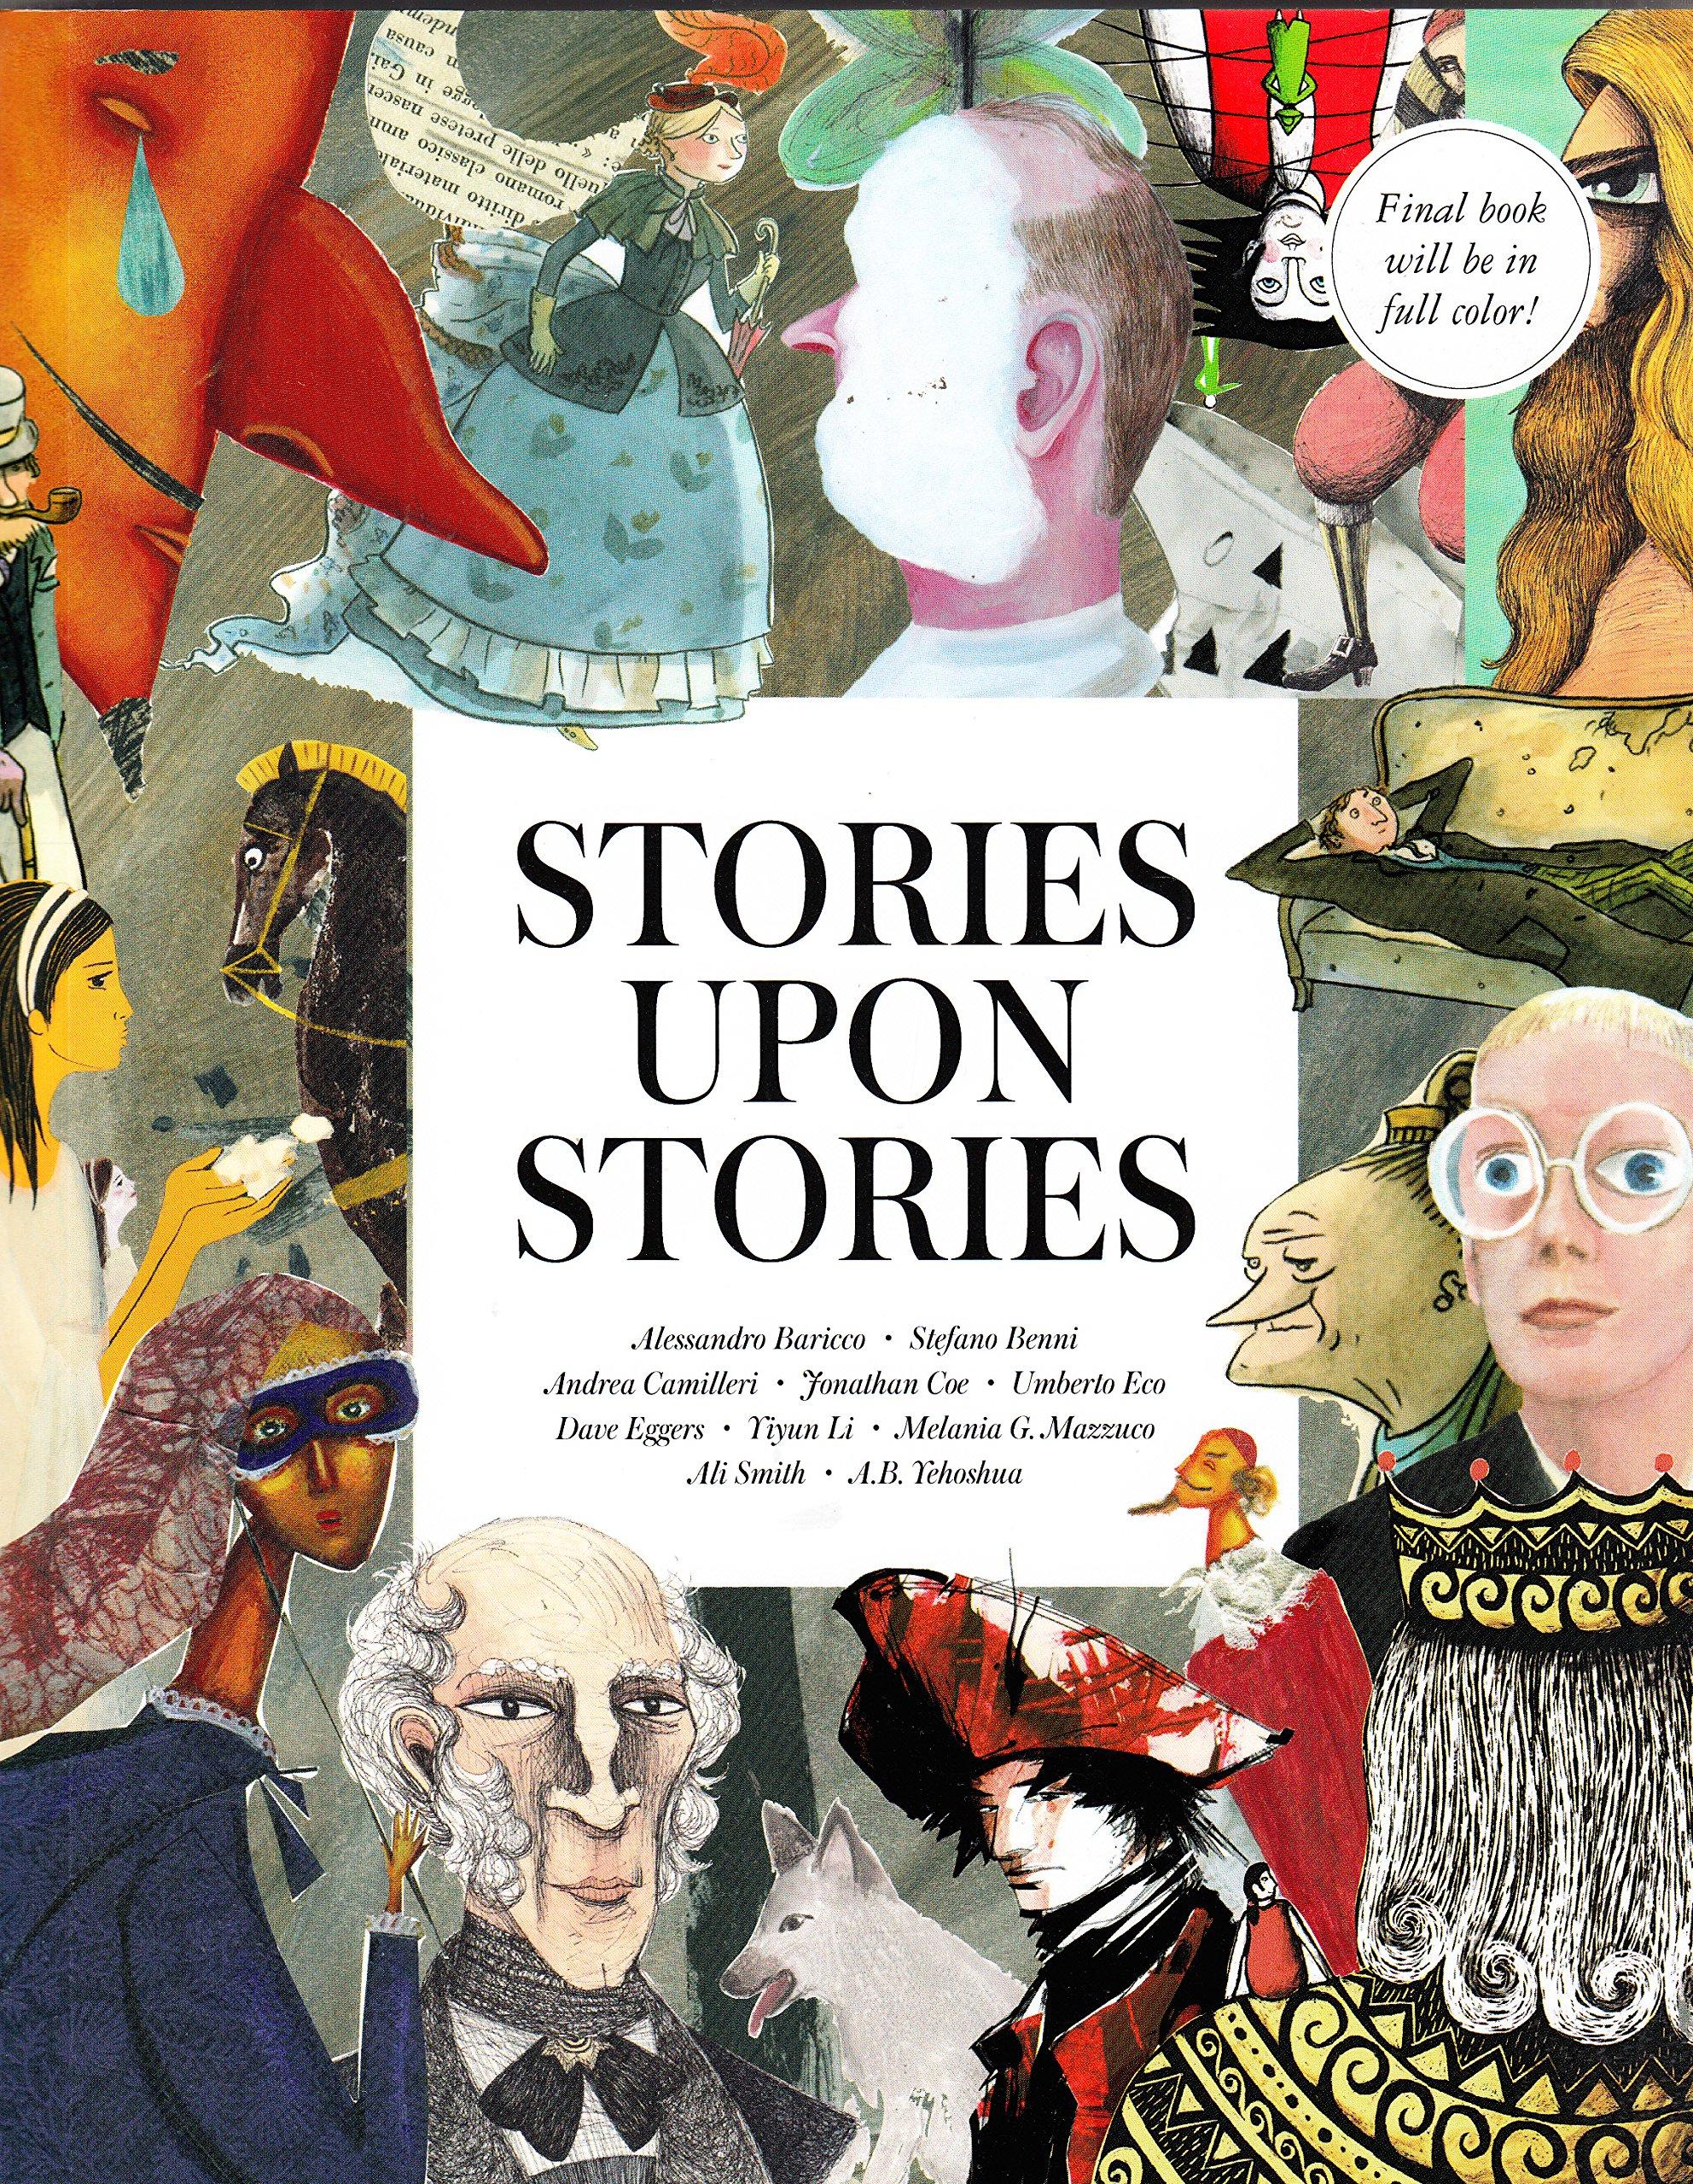 Amazon: Stories Upon Stories (9781940450018): Dave Eggers, Alessandro  Baricco, Yiyun Li, Umberto Eco, Abraham Yehoshua: Books